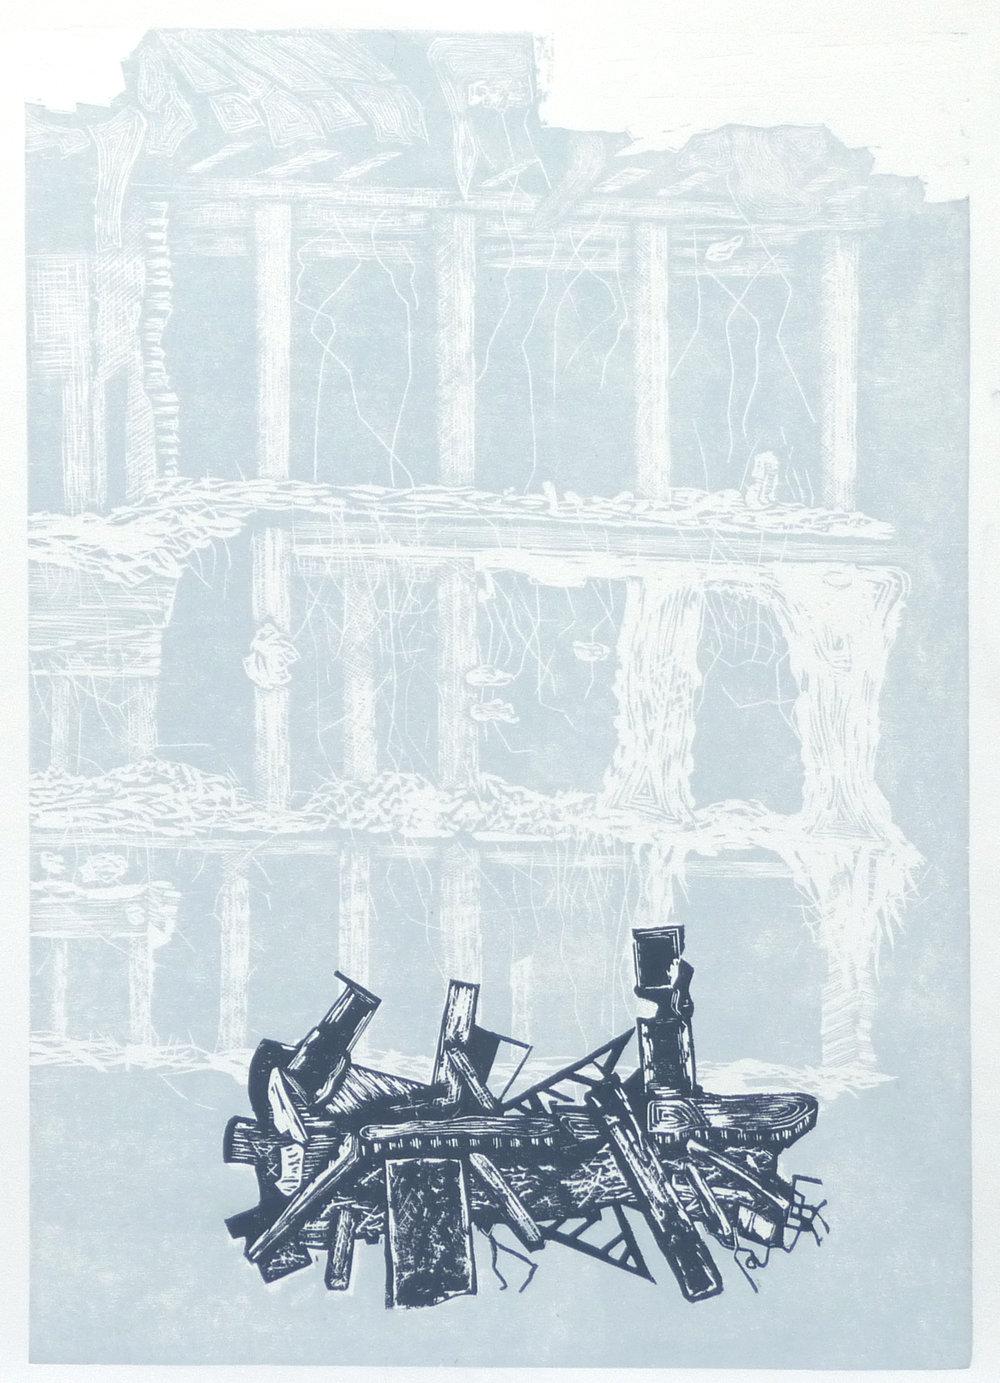 Facade ii, woodcut, 45 x 64 cm, 2018